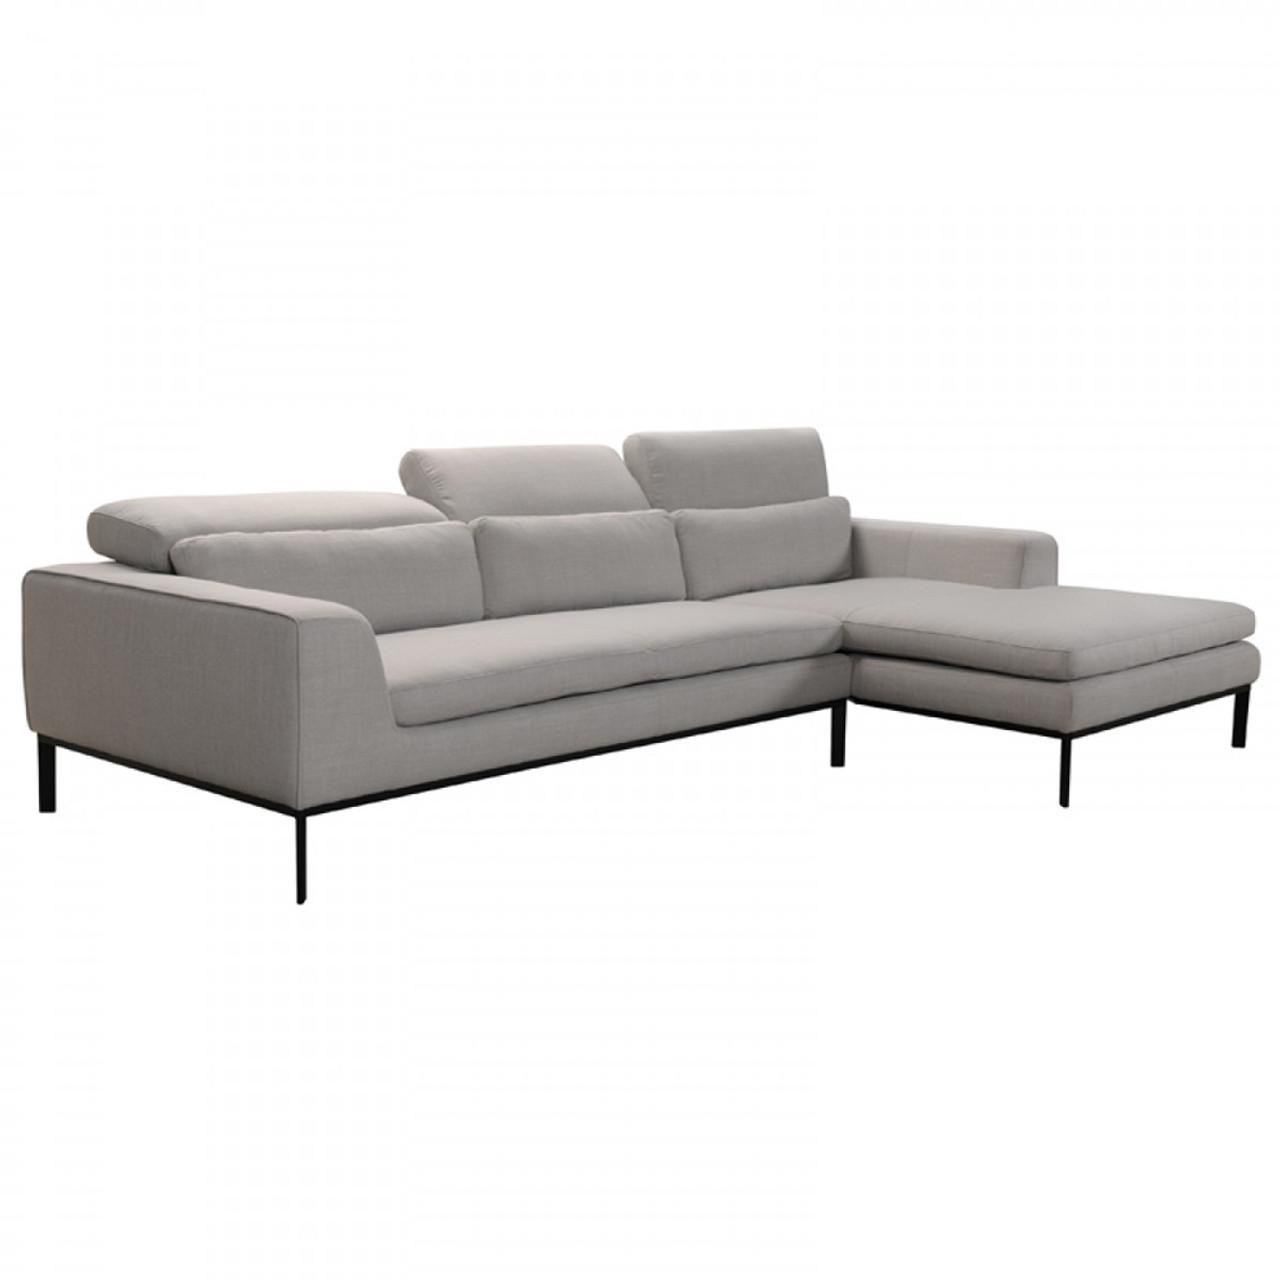 Divani Casa Clayton Modern Fabric Sectional Sofa - Lounge LA